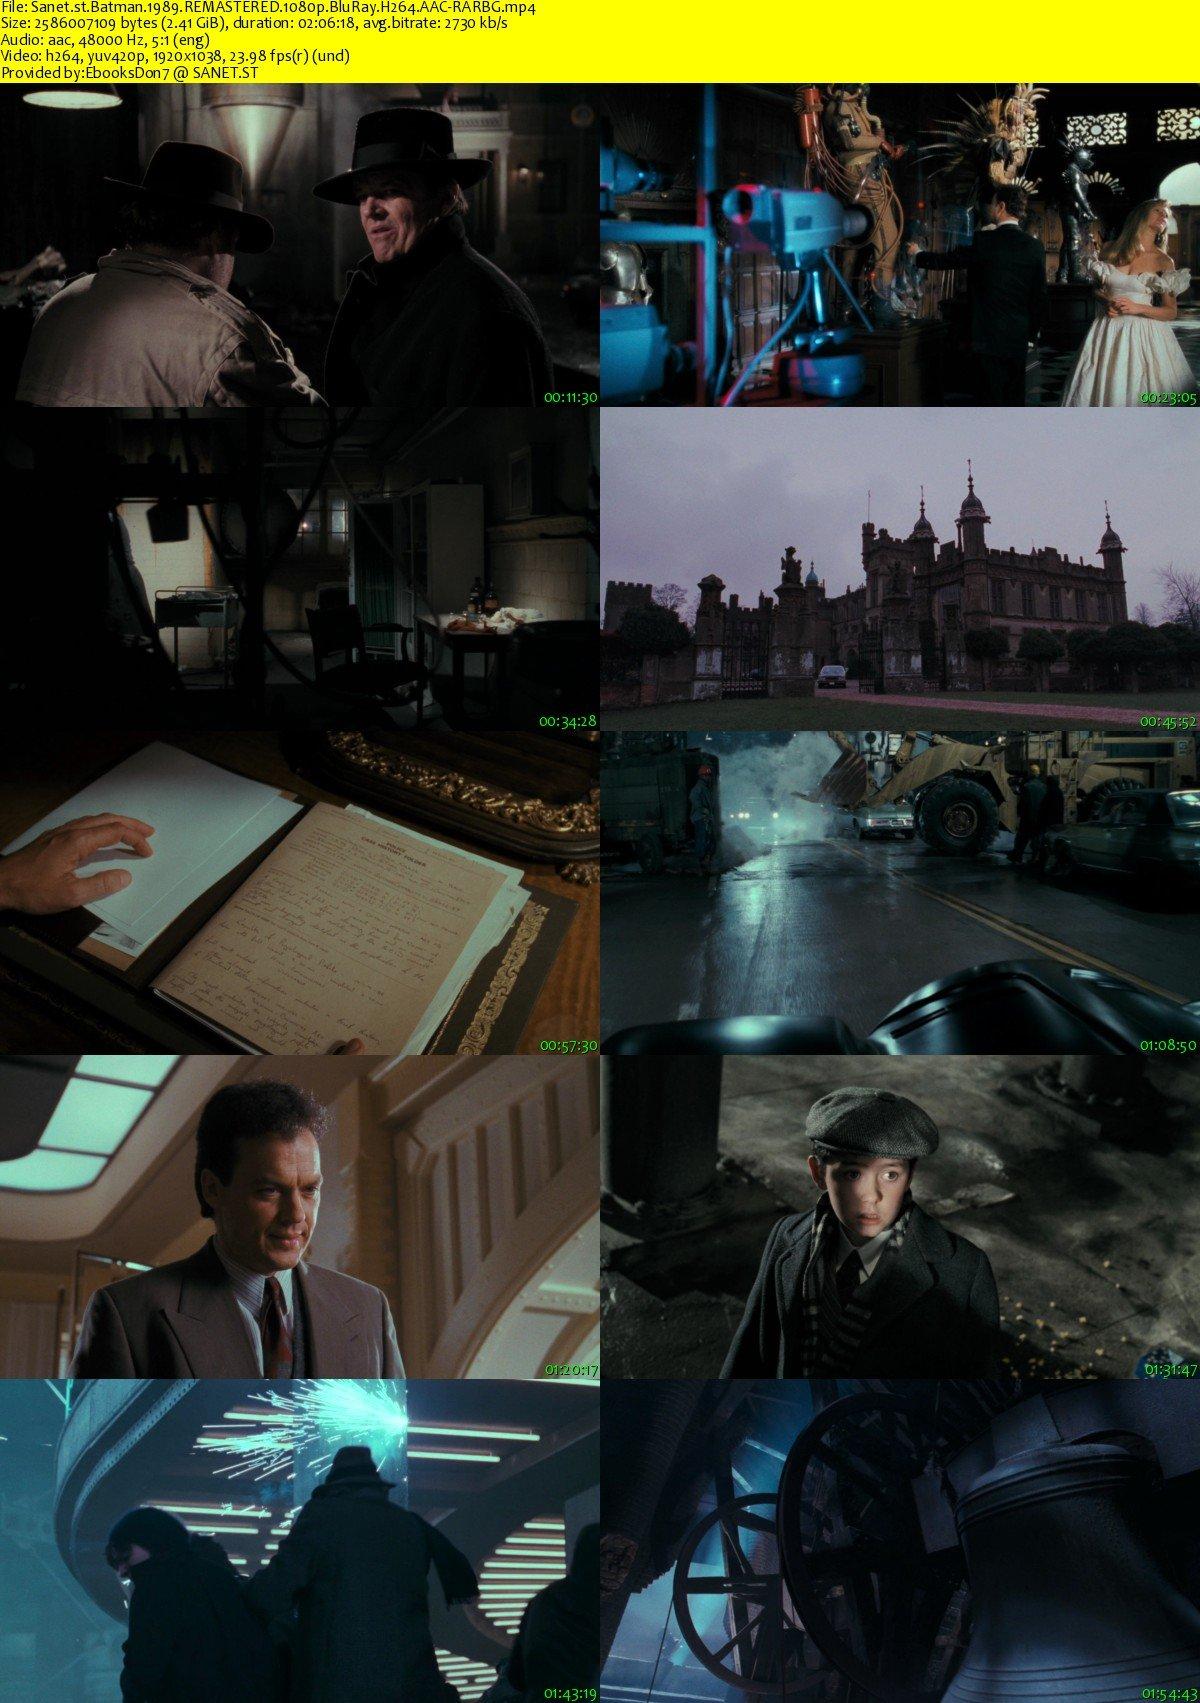 Download Batman 1989 REMASTERED 1080p BluRay H264 AAC-RARBG - SoftArchive